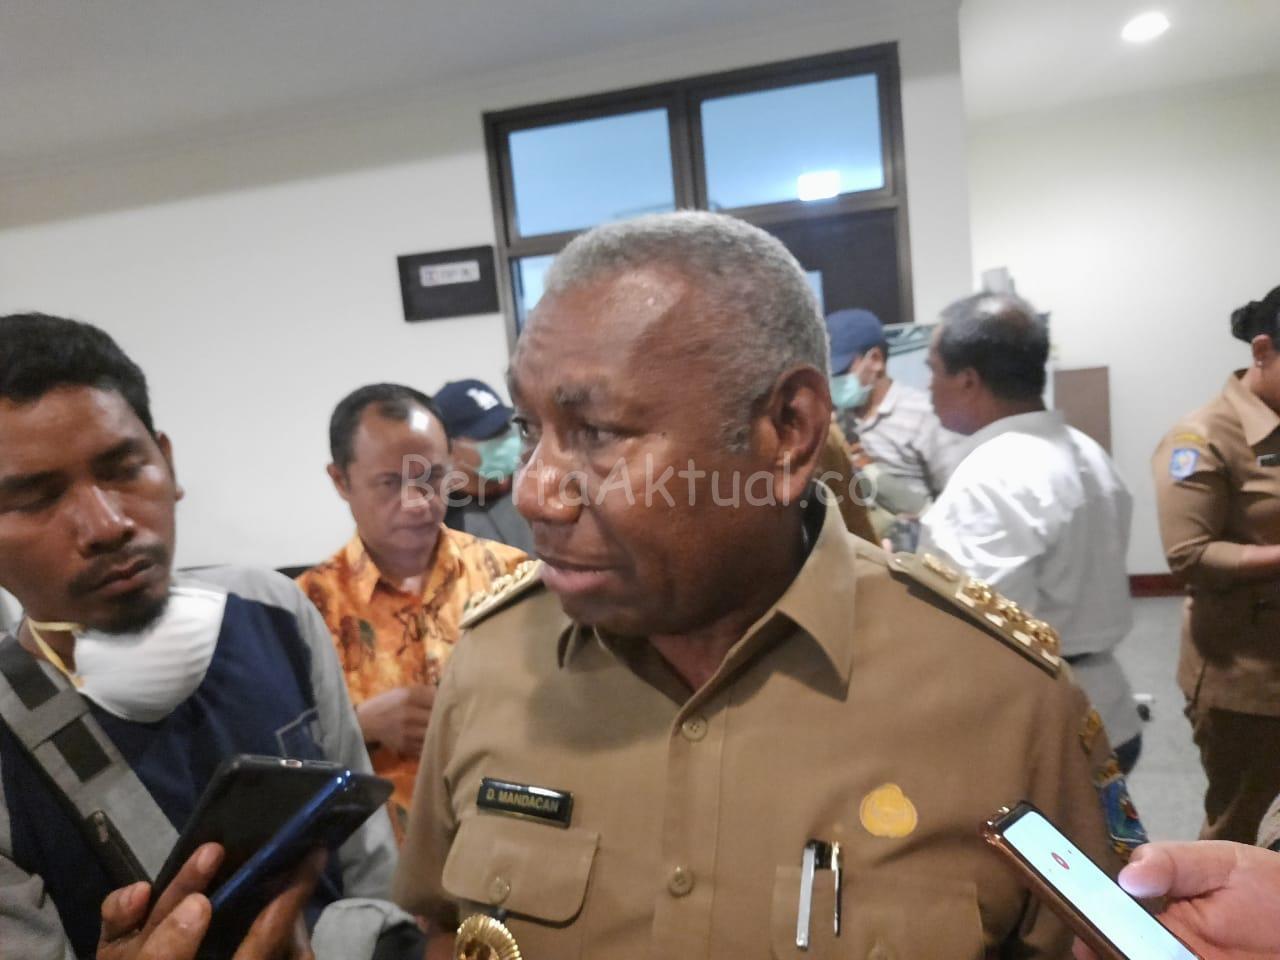 Gubernur: Jika Papua Barat Lockdown Perekonomian Akan Goyah 2 IMG 20200325 WA0004